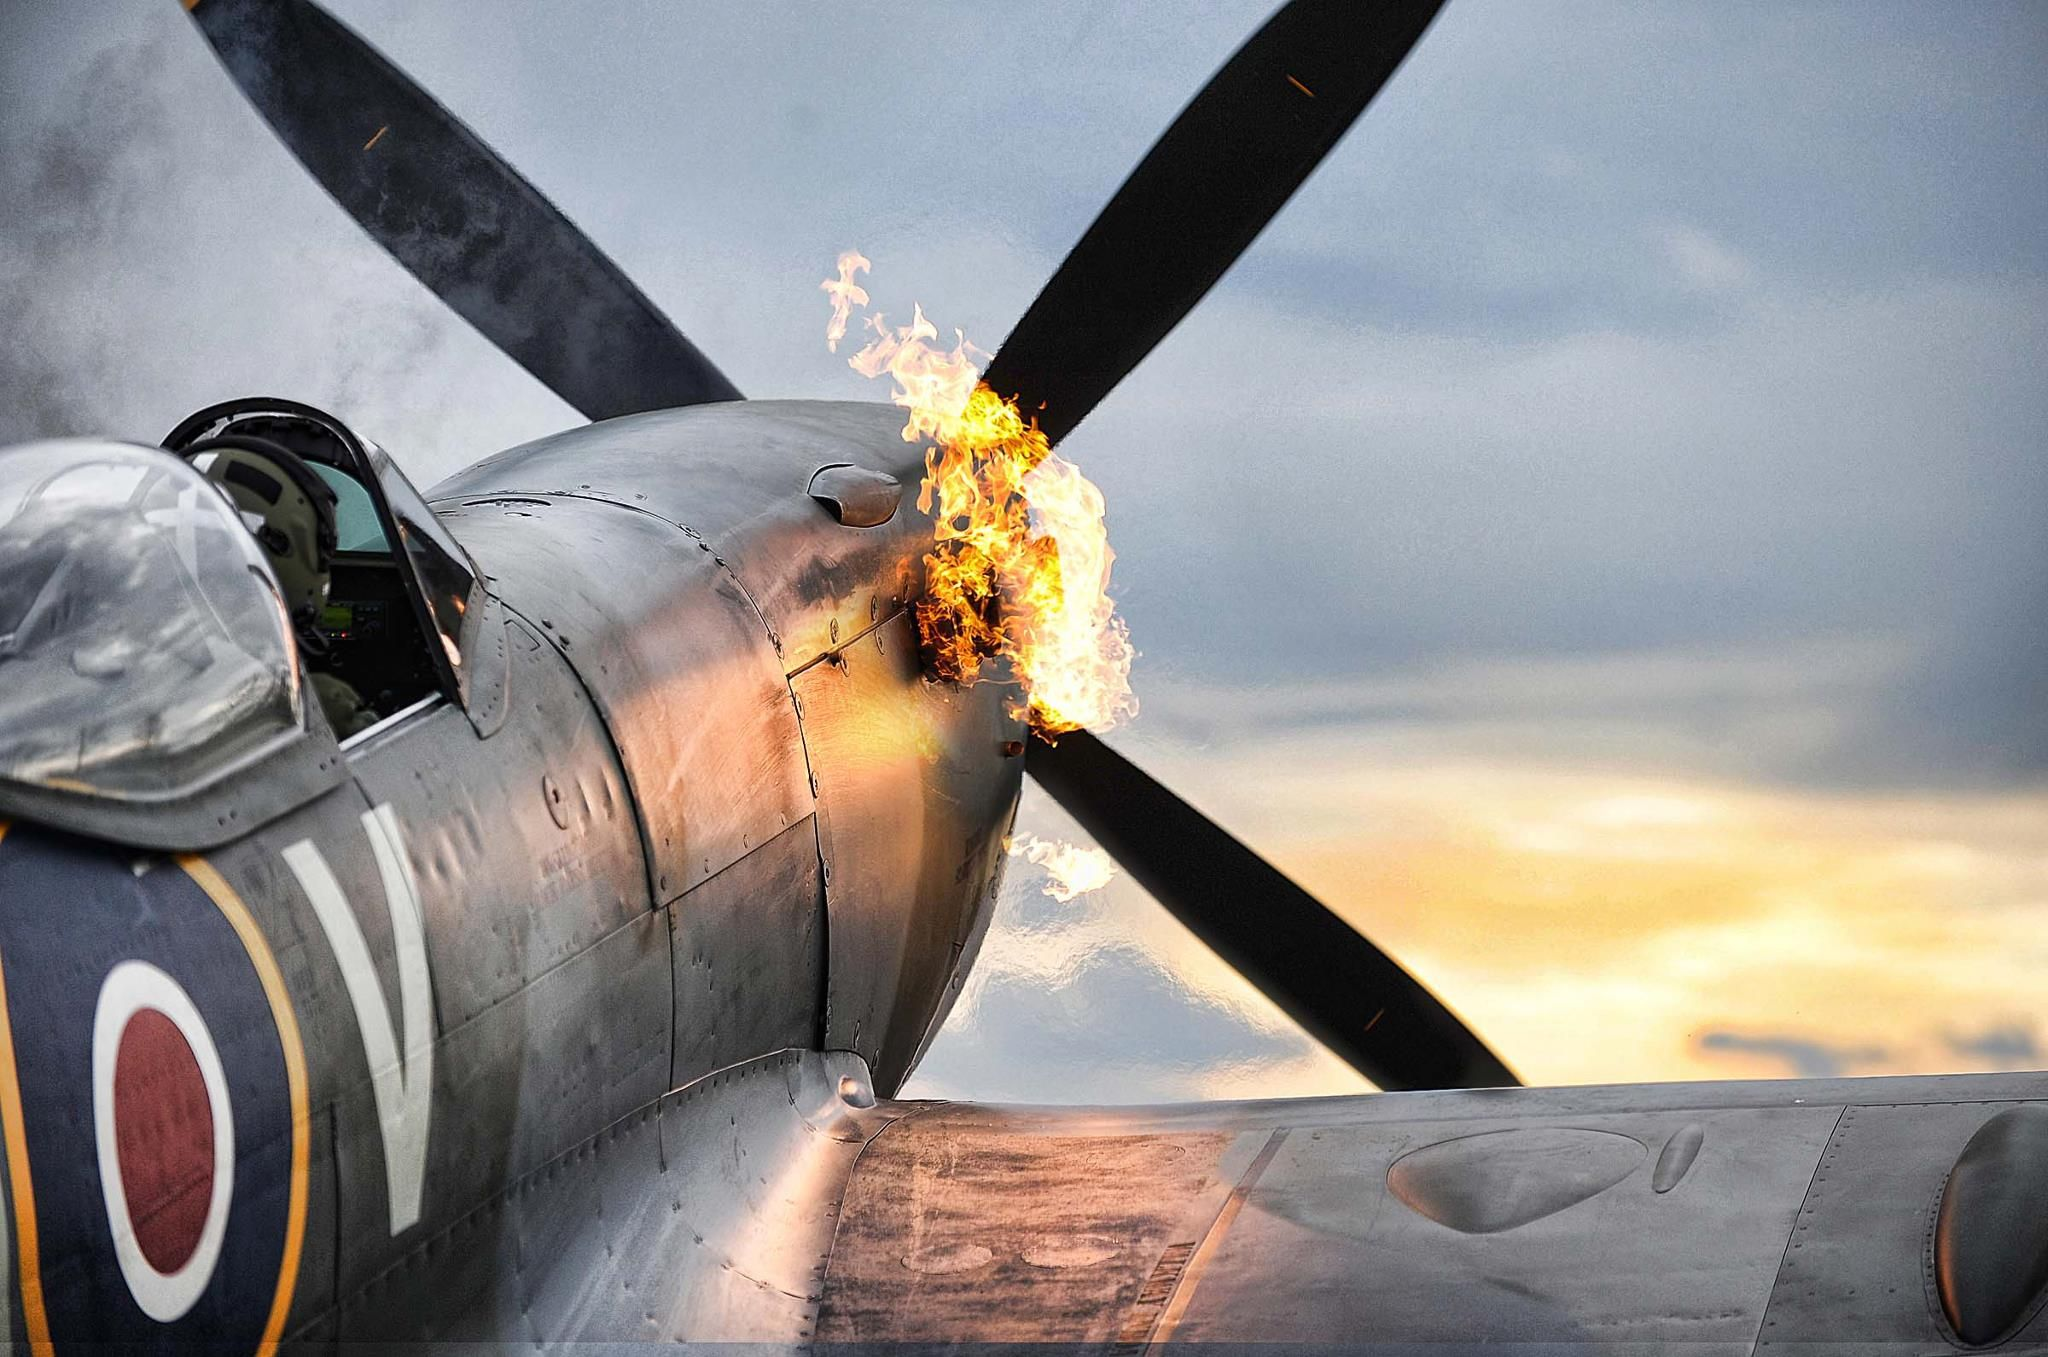 Spitfire Wallpaper Samoloty wojskowe, Lotnictwo i Zdjęcia